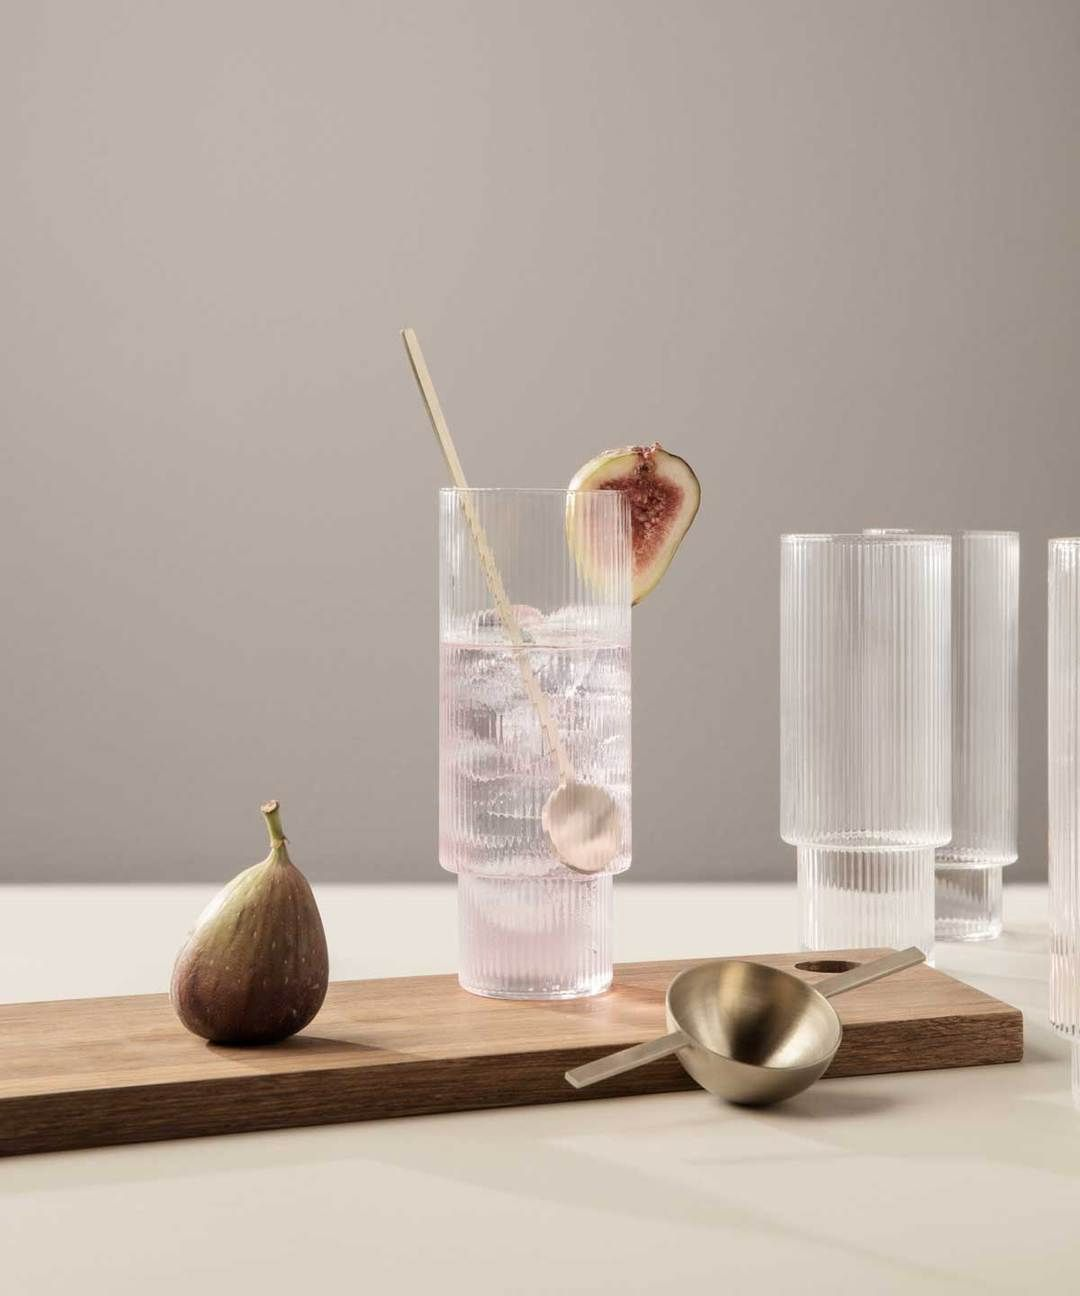 Ripple Long Drink Glasses Set Of 4 In 2020 Long Drink Glasses Drinking Glass Set